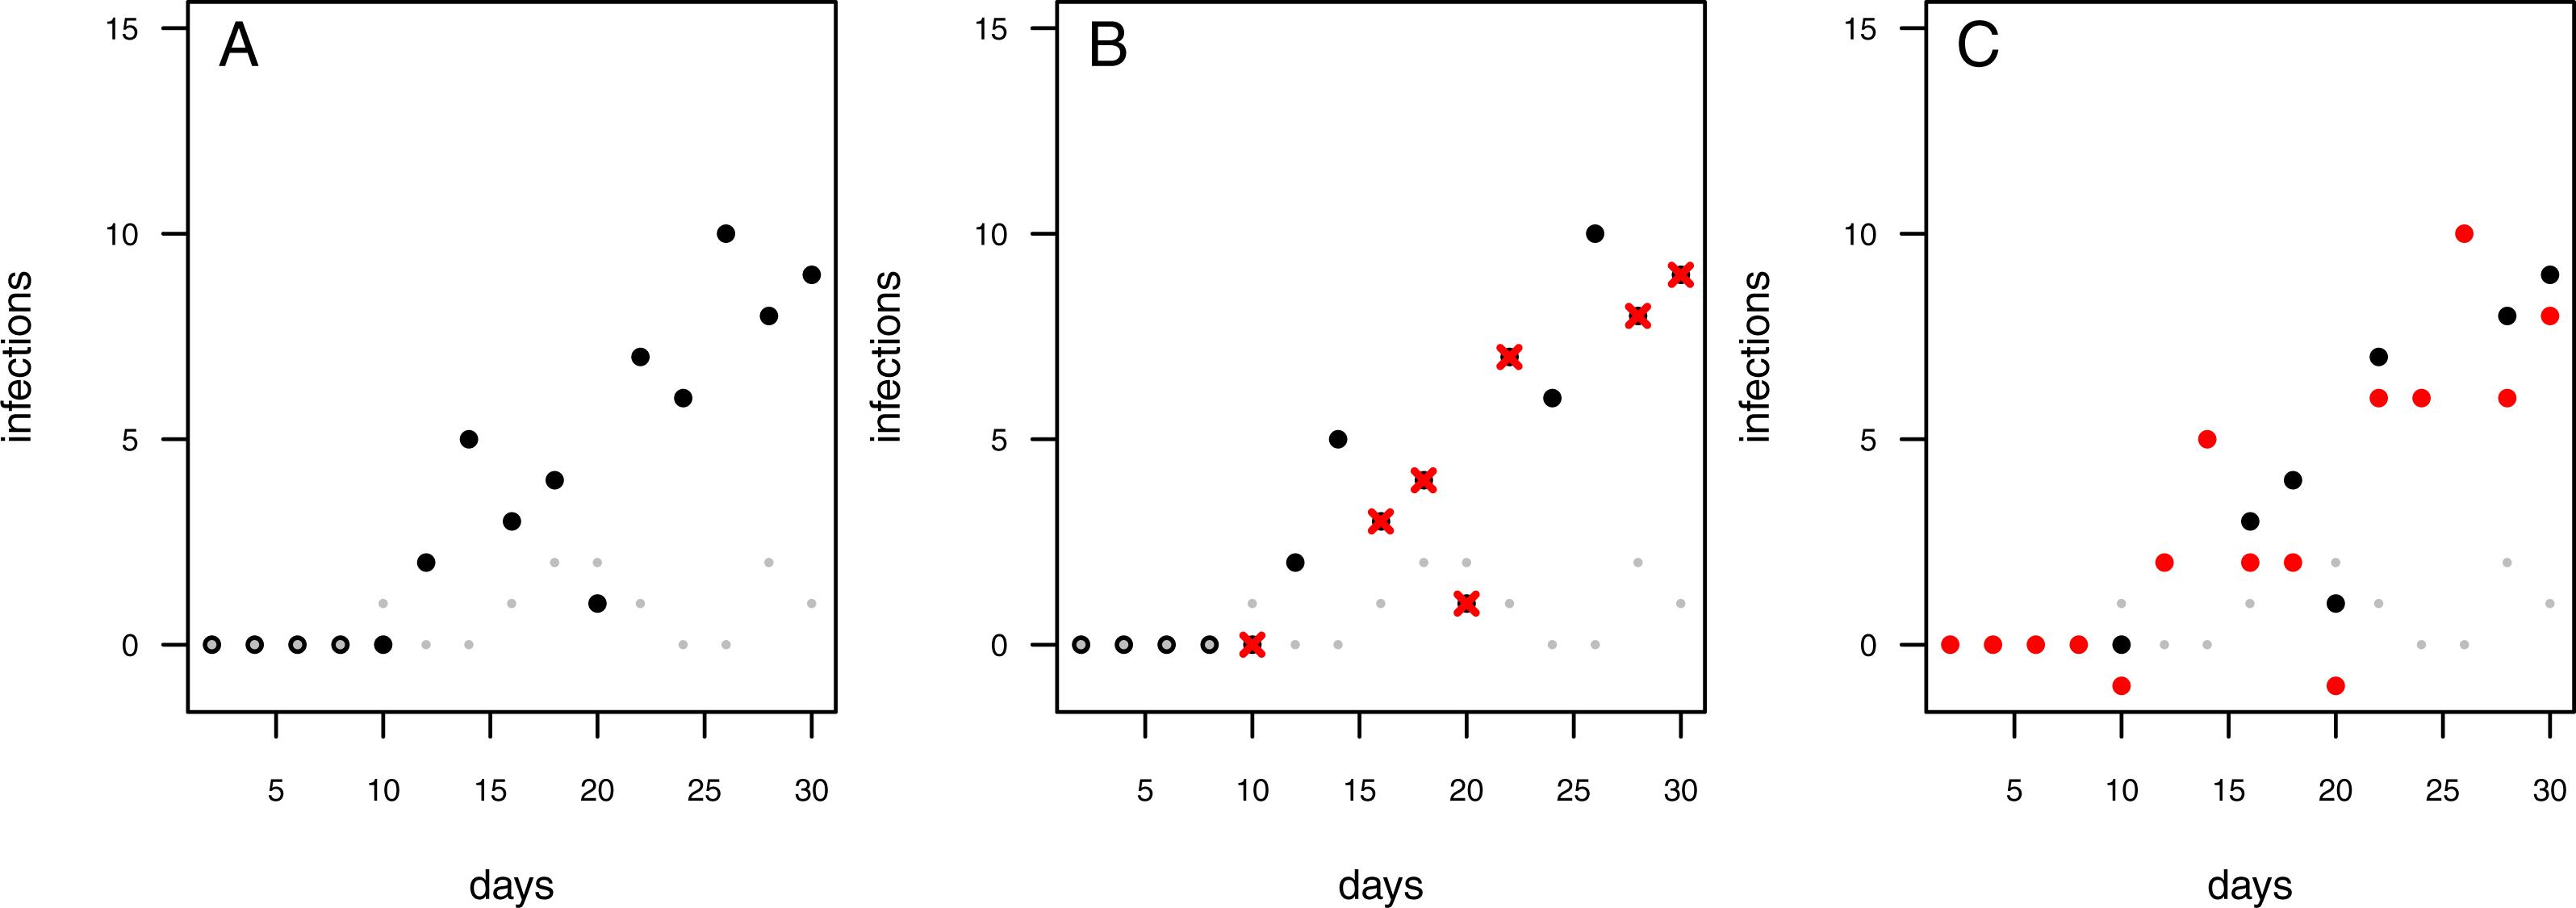 Yzing Pathogen Suppressiveness In Bioassays With Natural Soils Using Integrative Maximum